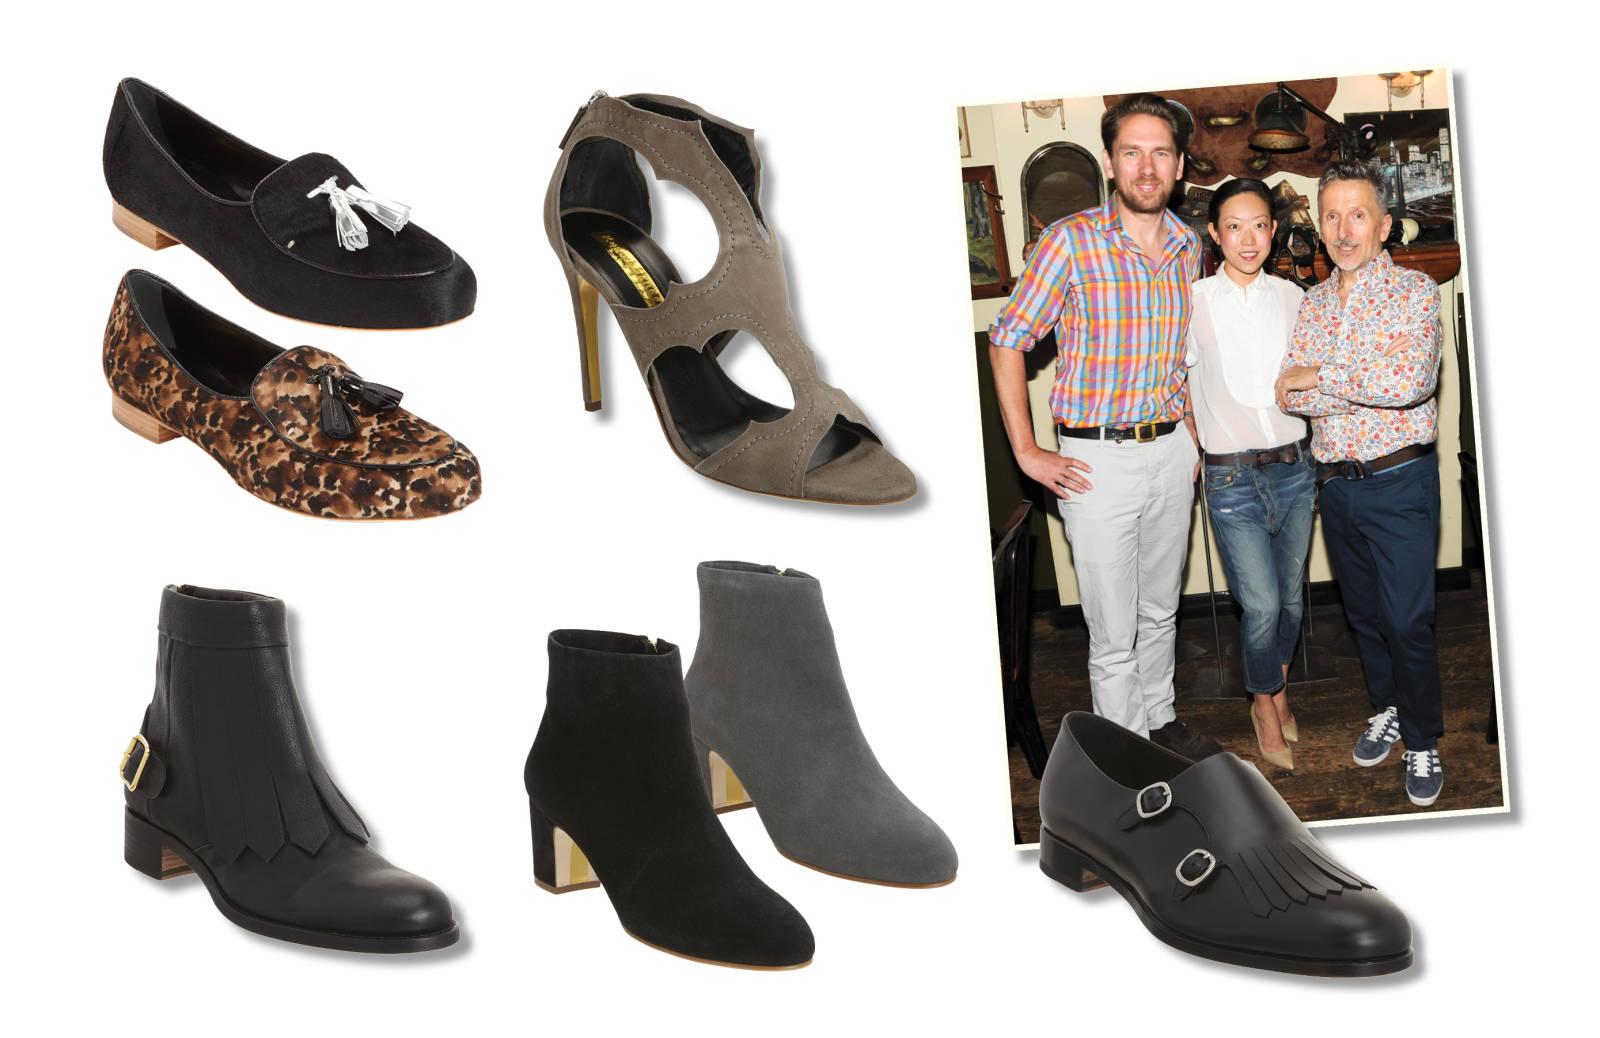 541b49626bd0a_-_tnc-rupert-sanders-on-barneys-shoes.jpeg